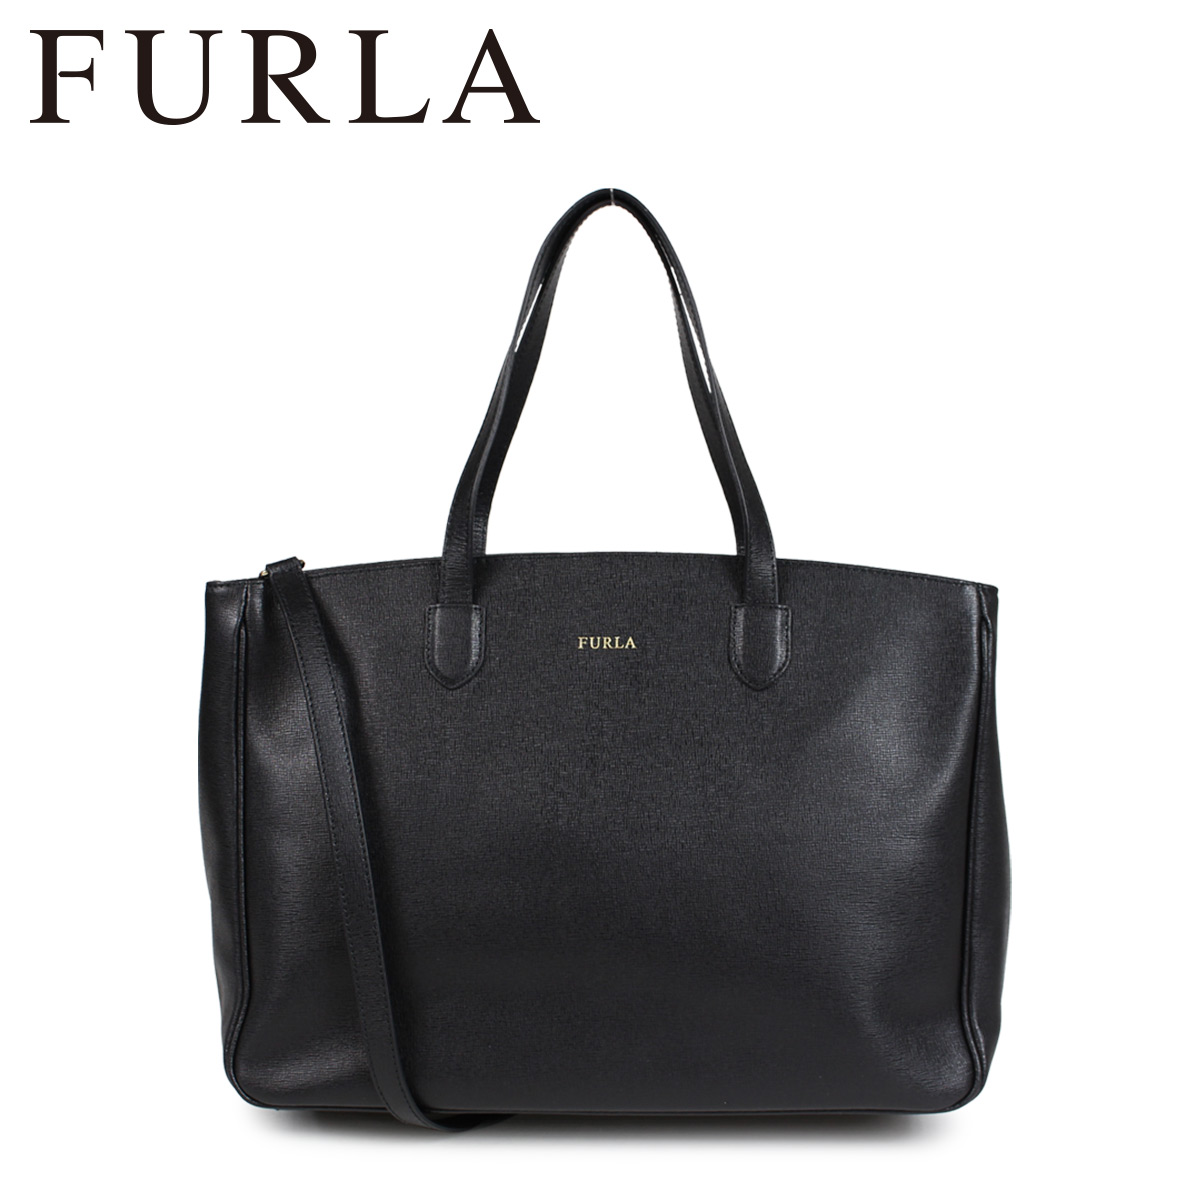 FURLA フルラ バッグ トートバッグ レディース PAMELA LEATHER TOTE BAG ブラック 920603